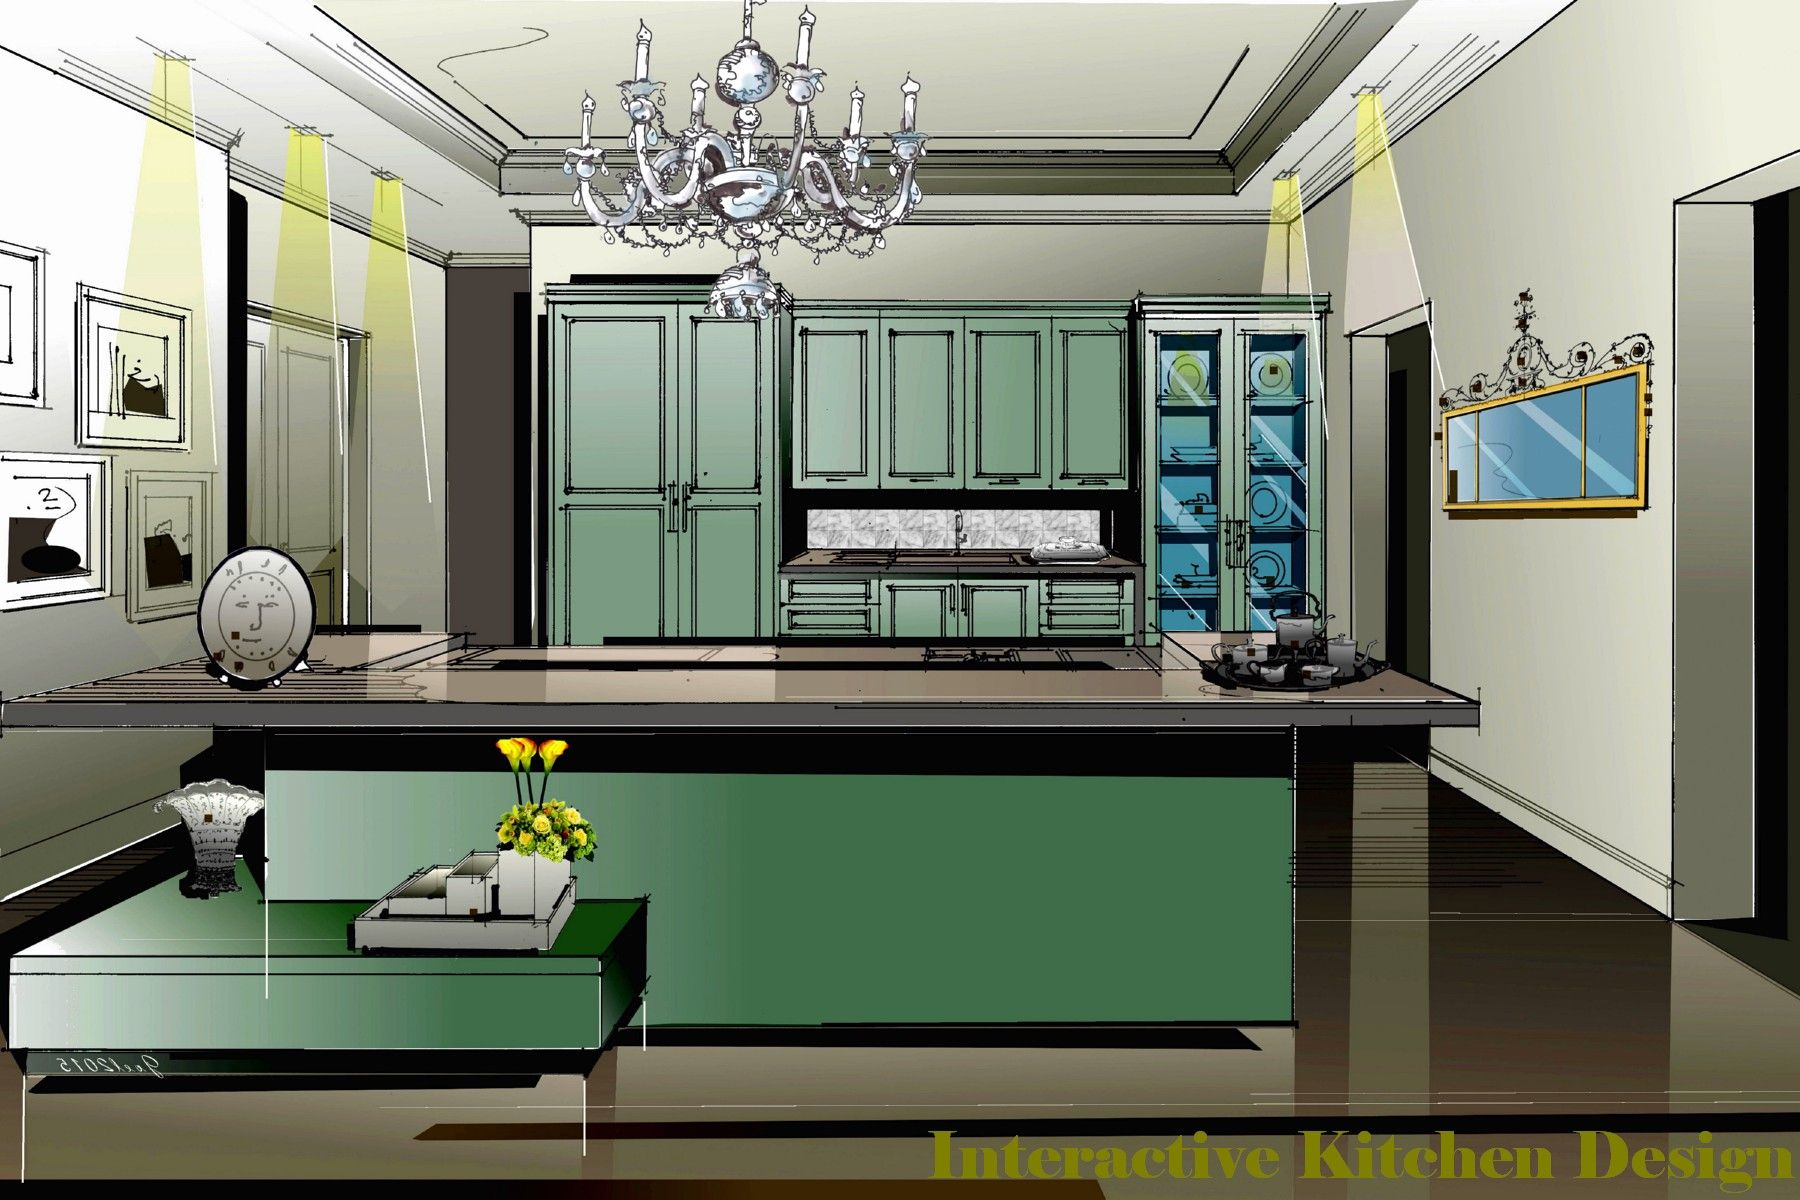 Cool Interactive Kitchen Design Bread Loaf Pans Pot Inserts Steamers Dinnerware Stemware Storage Serveware Kitchen Appliances Food Processors Baking Pastry Tool